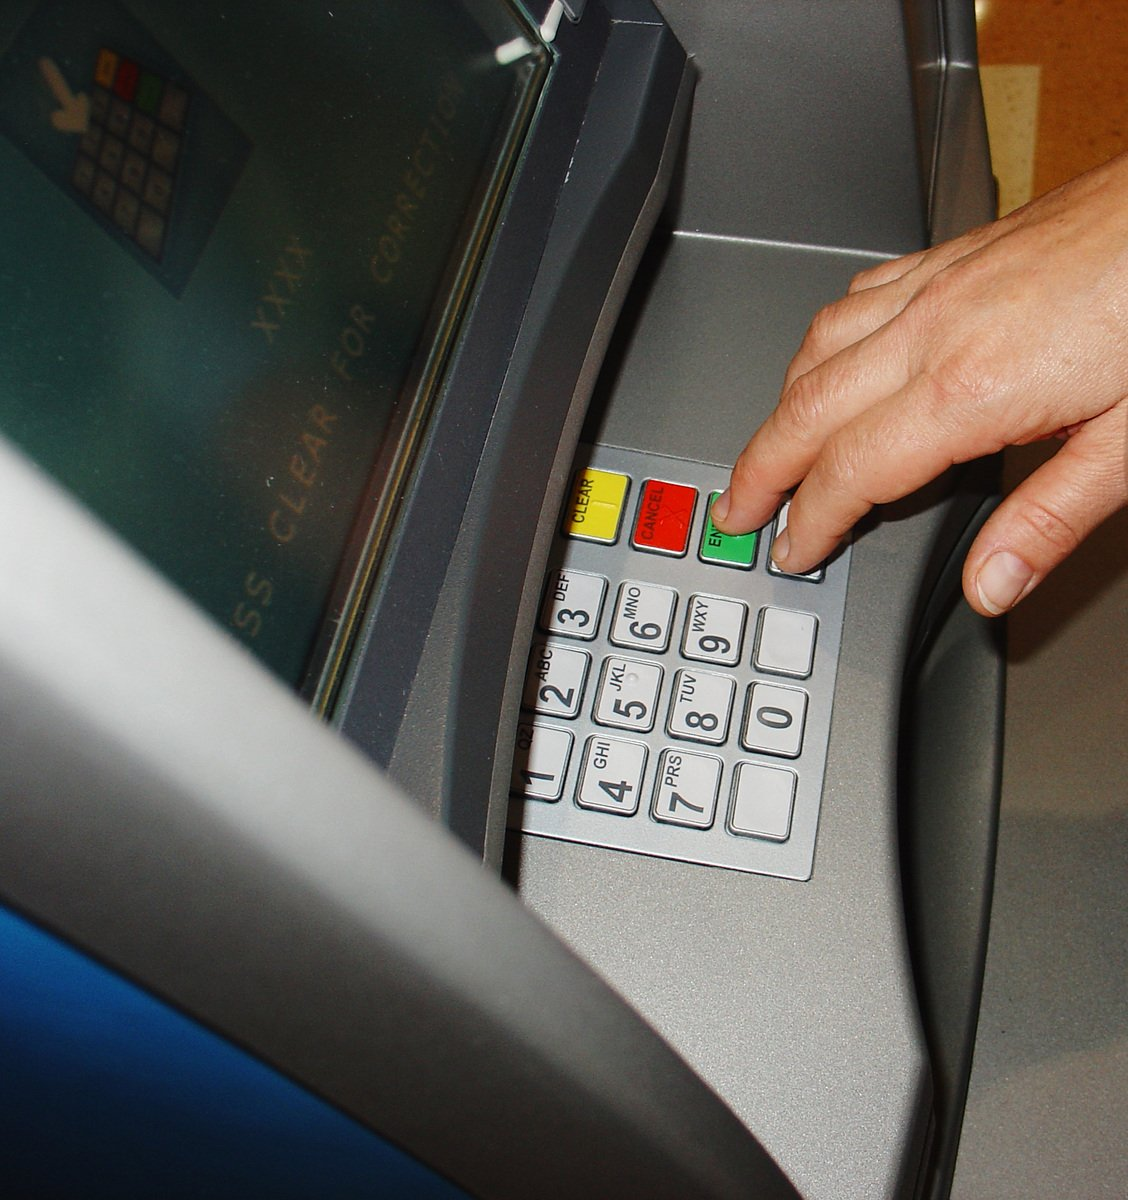 Sending money with Chivo ATM